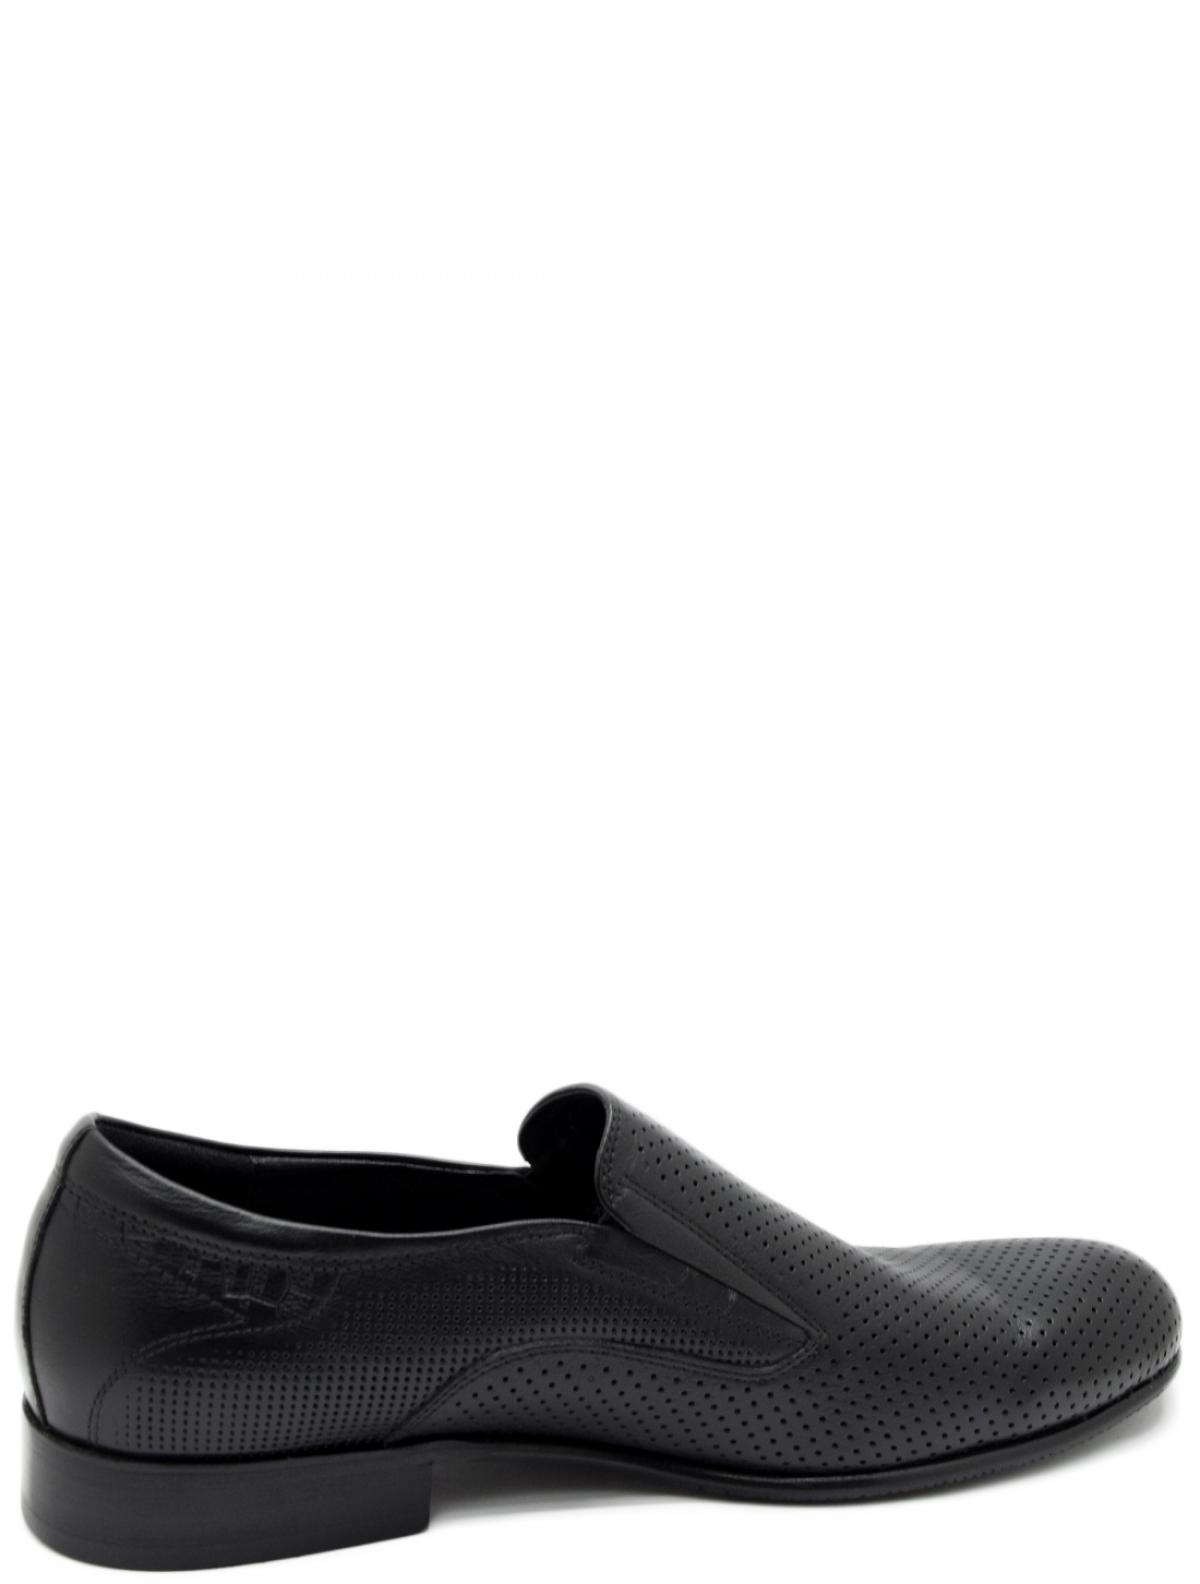 Rosconi R87207YC-428-6778C мужские туфли